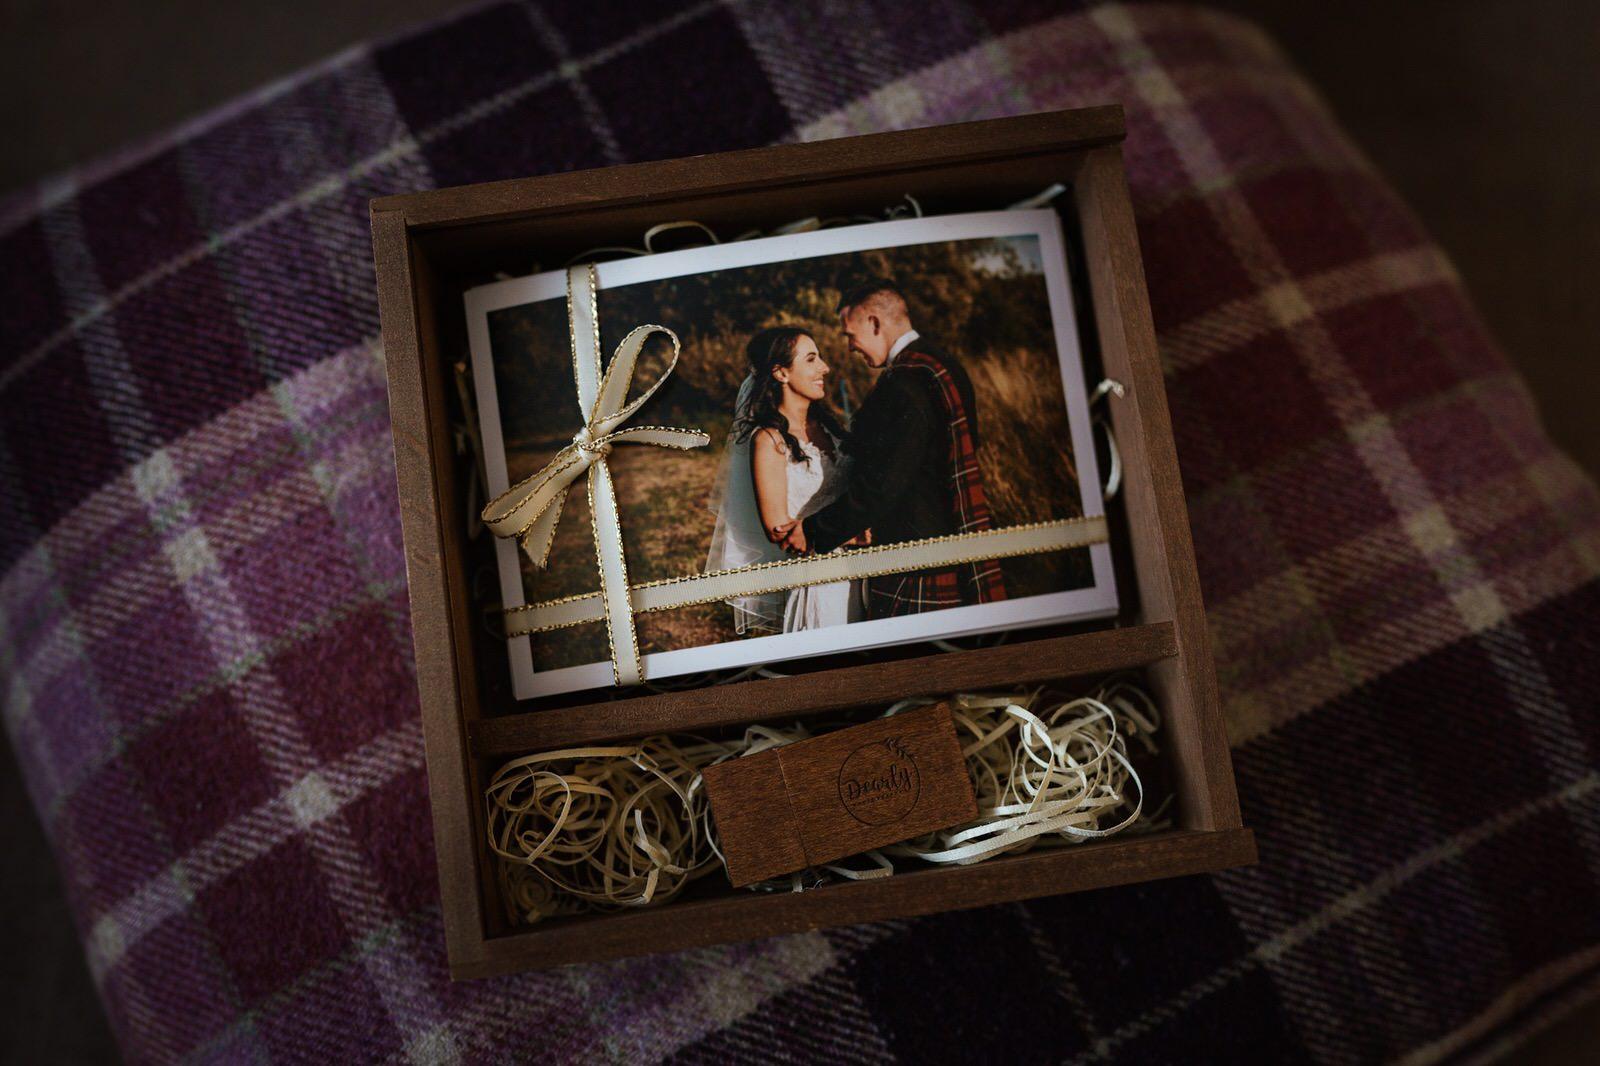 glasgow Edinburgh wedding photography prints usb box